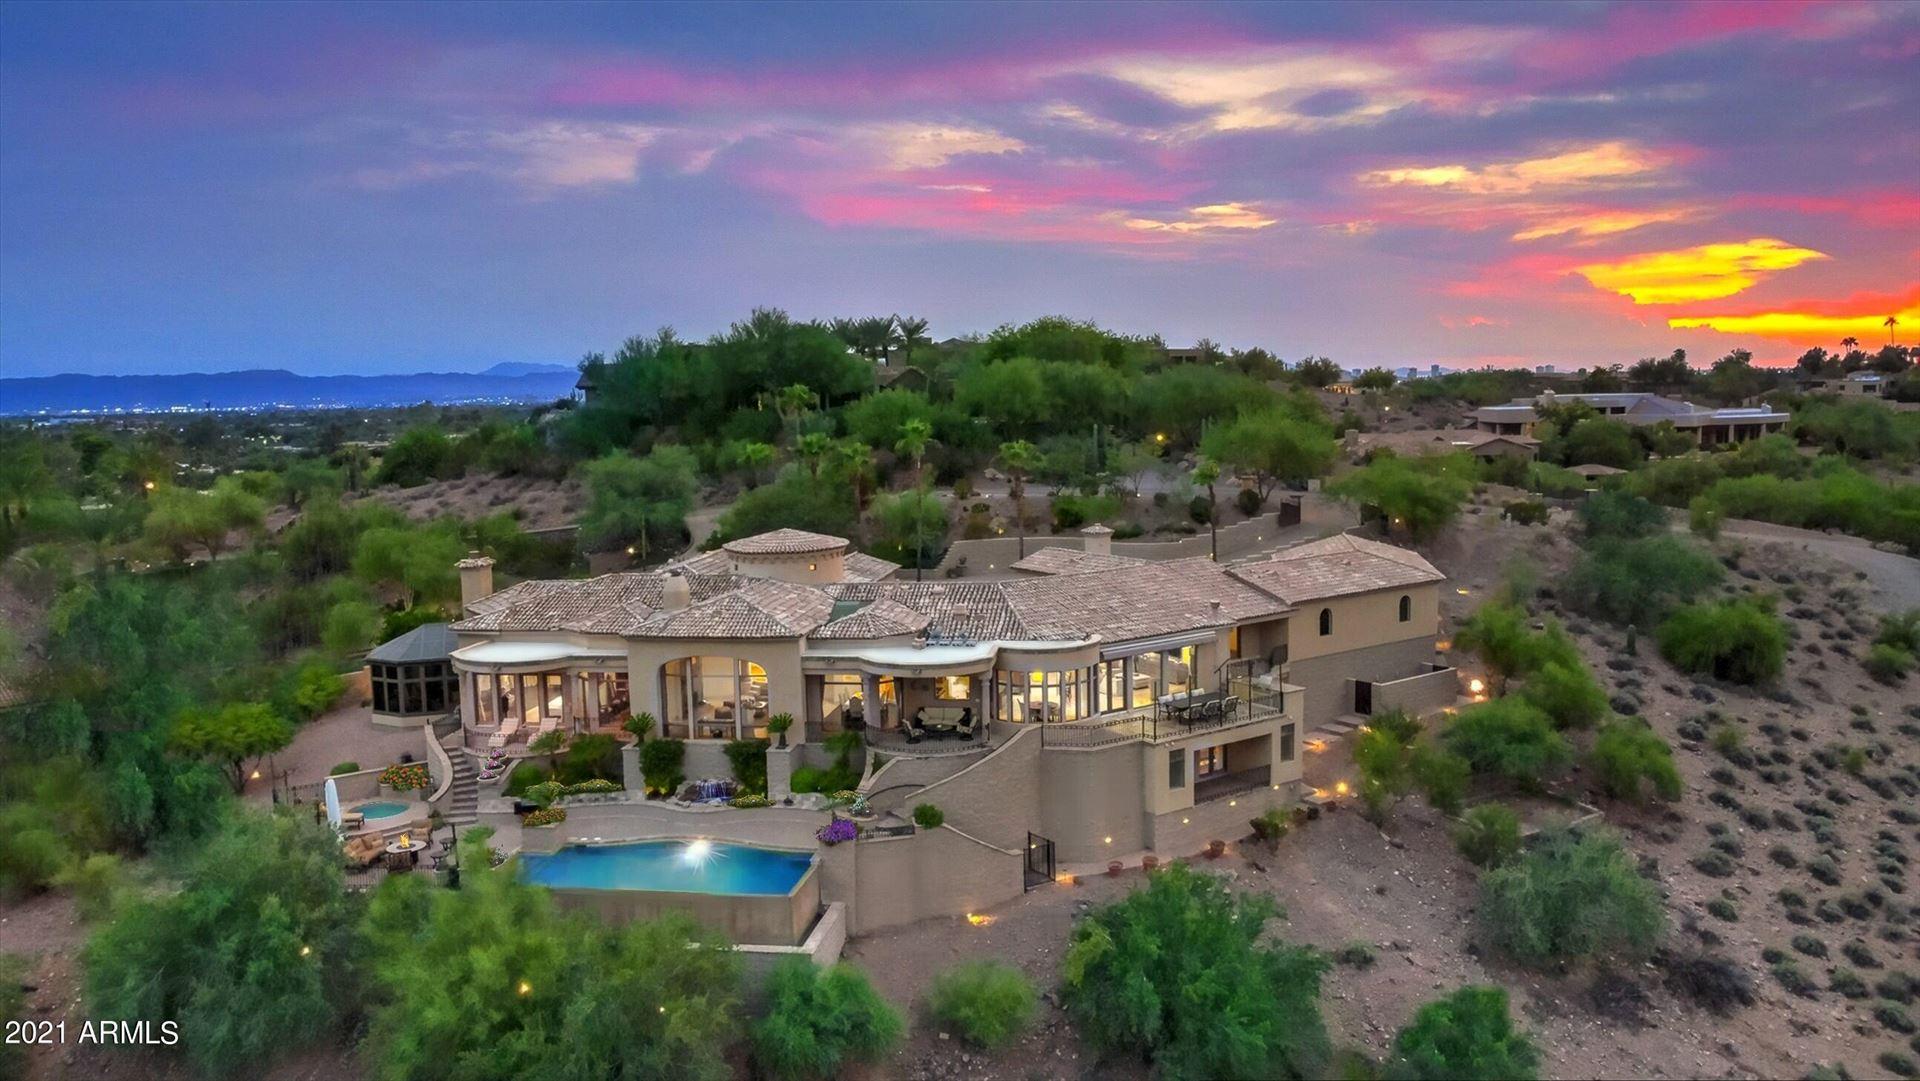 Photo of 4490 E VALLEY VISTA Lane, Paradise Valley, AZ 85253 (MLS # 6303209)